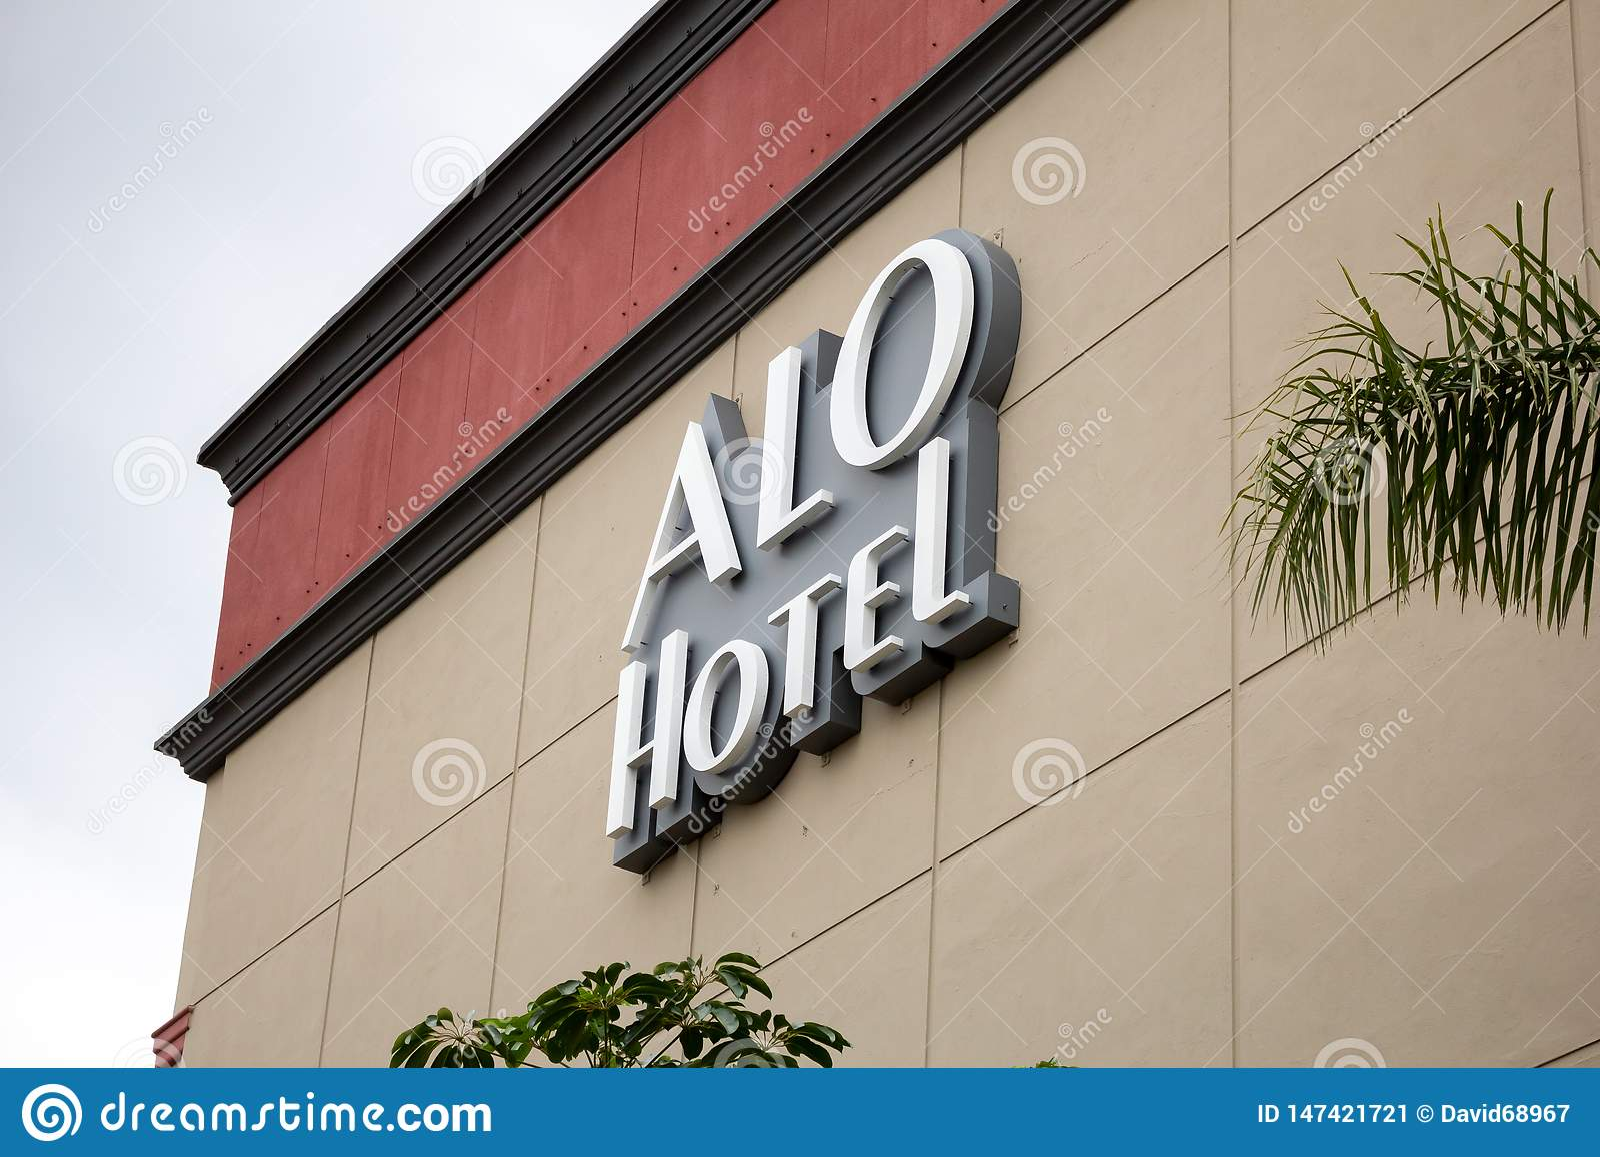 ALO Hotel sign